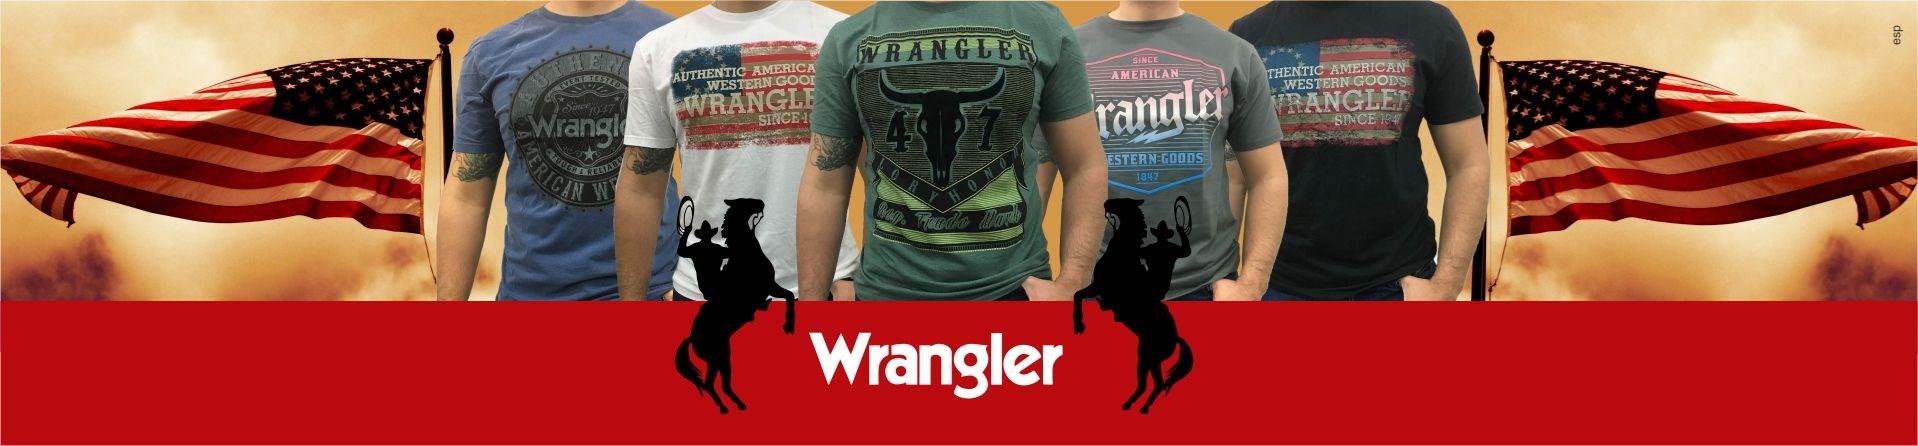 camiseta wrangler